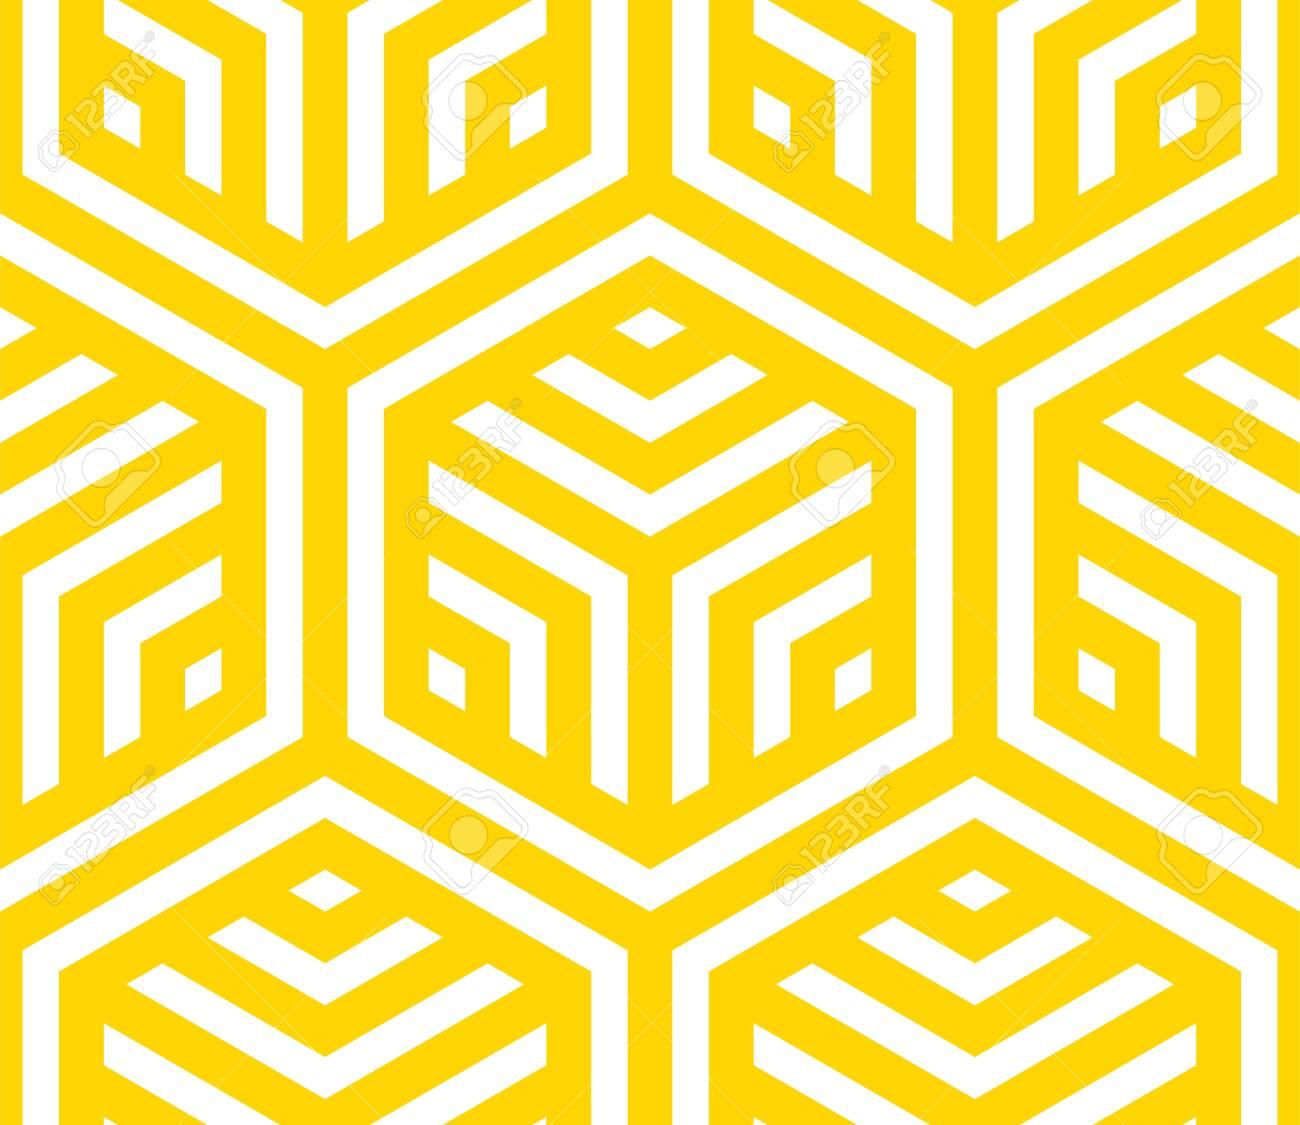 Seamless geometric pattern. Vector hexagonal yellow pattern. - 145208421